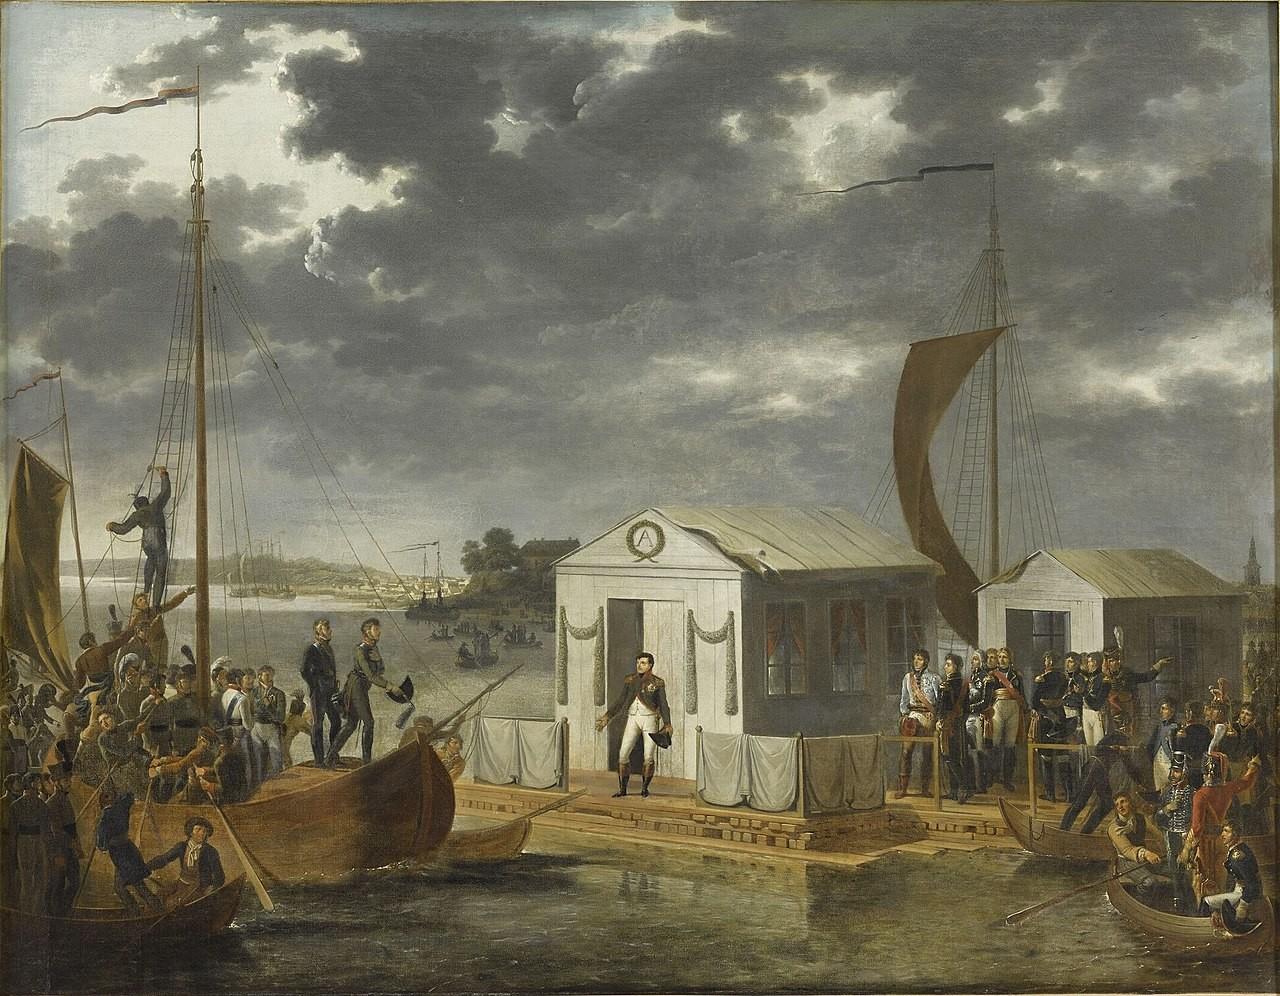 Встреча Наполеона I и Aлександра I на Немане 25 июня 1807 года. Адольф Роэн.